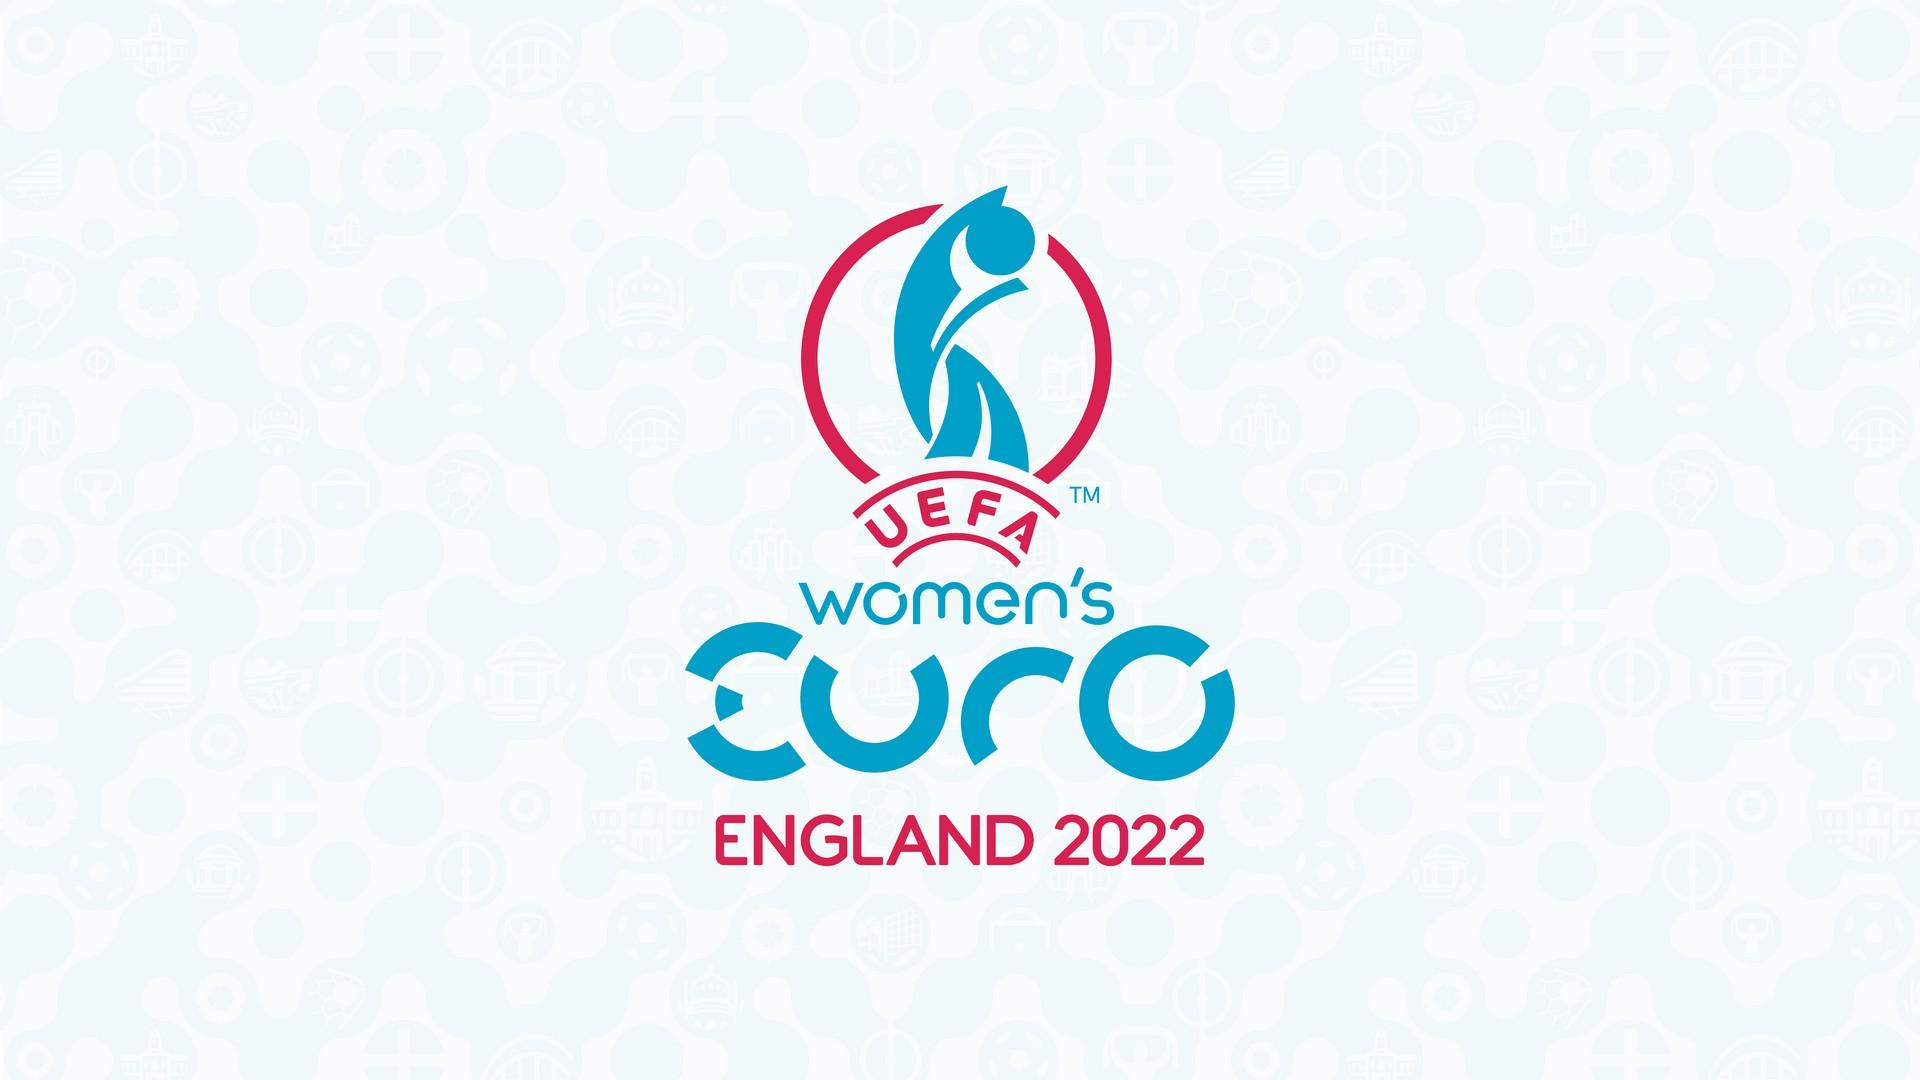 Football – Womens Euro 2022 (1) logo